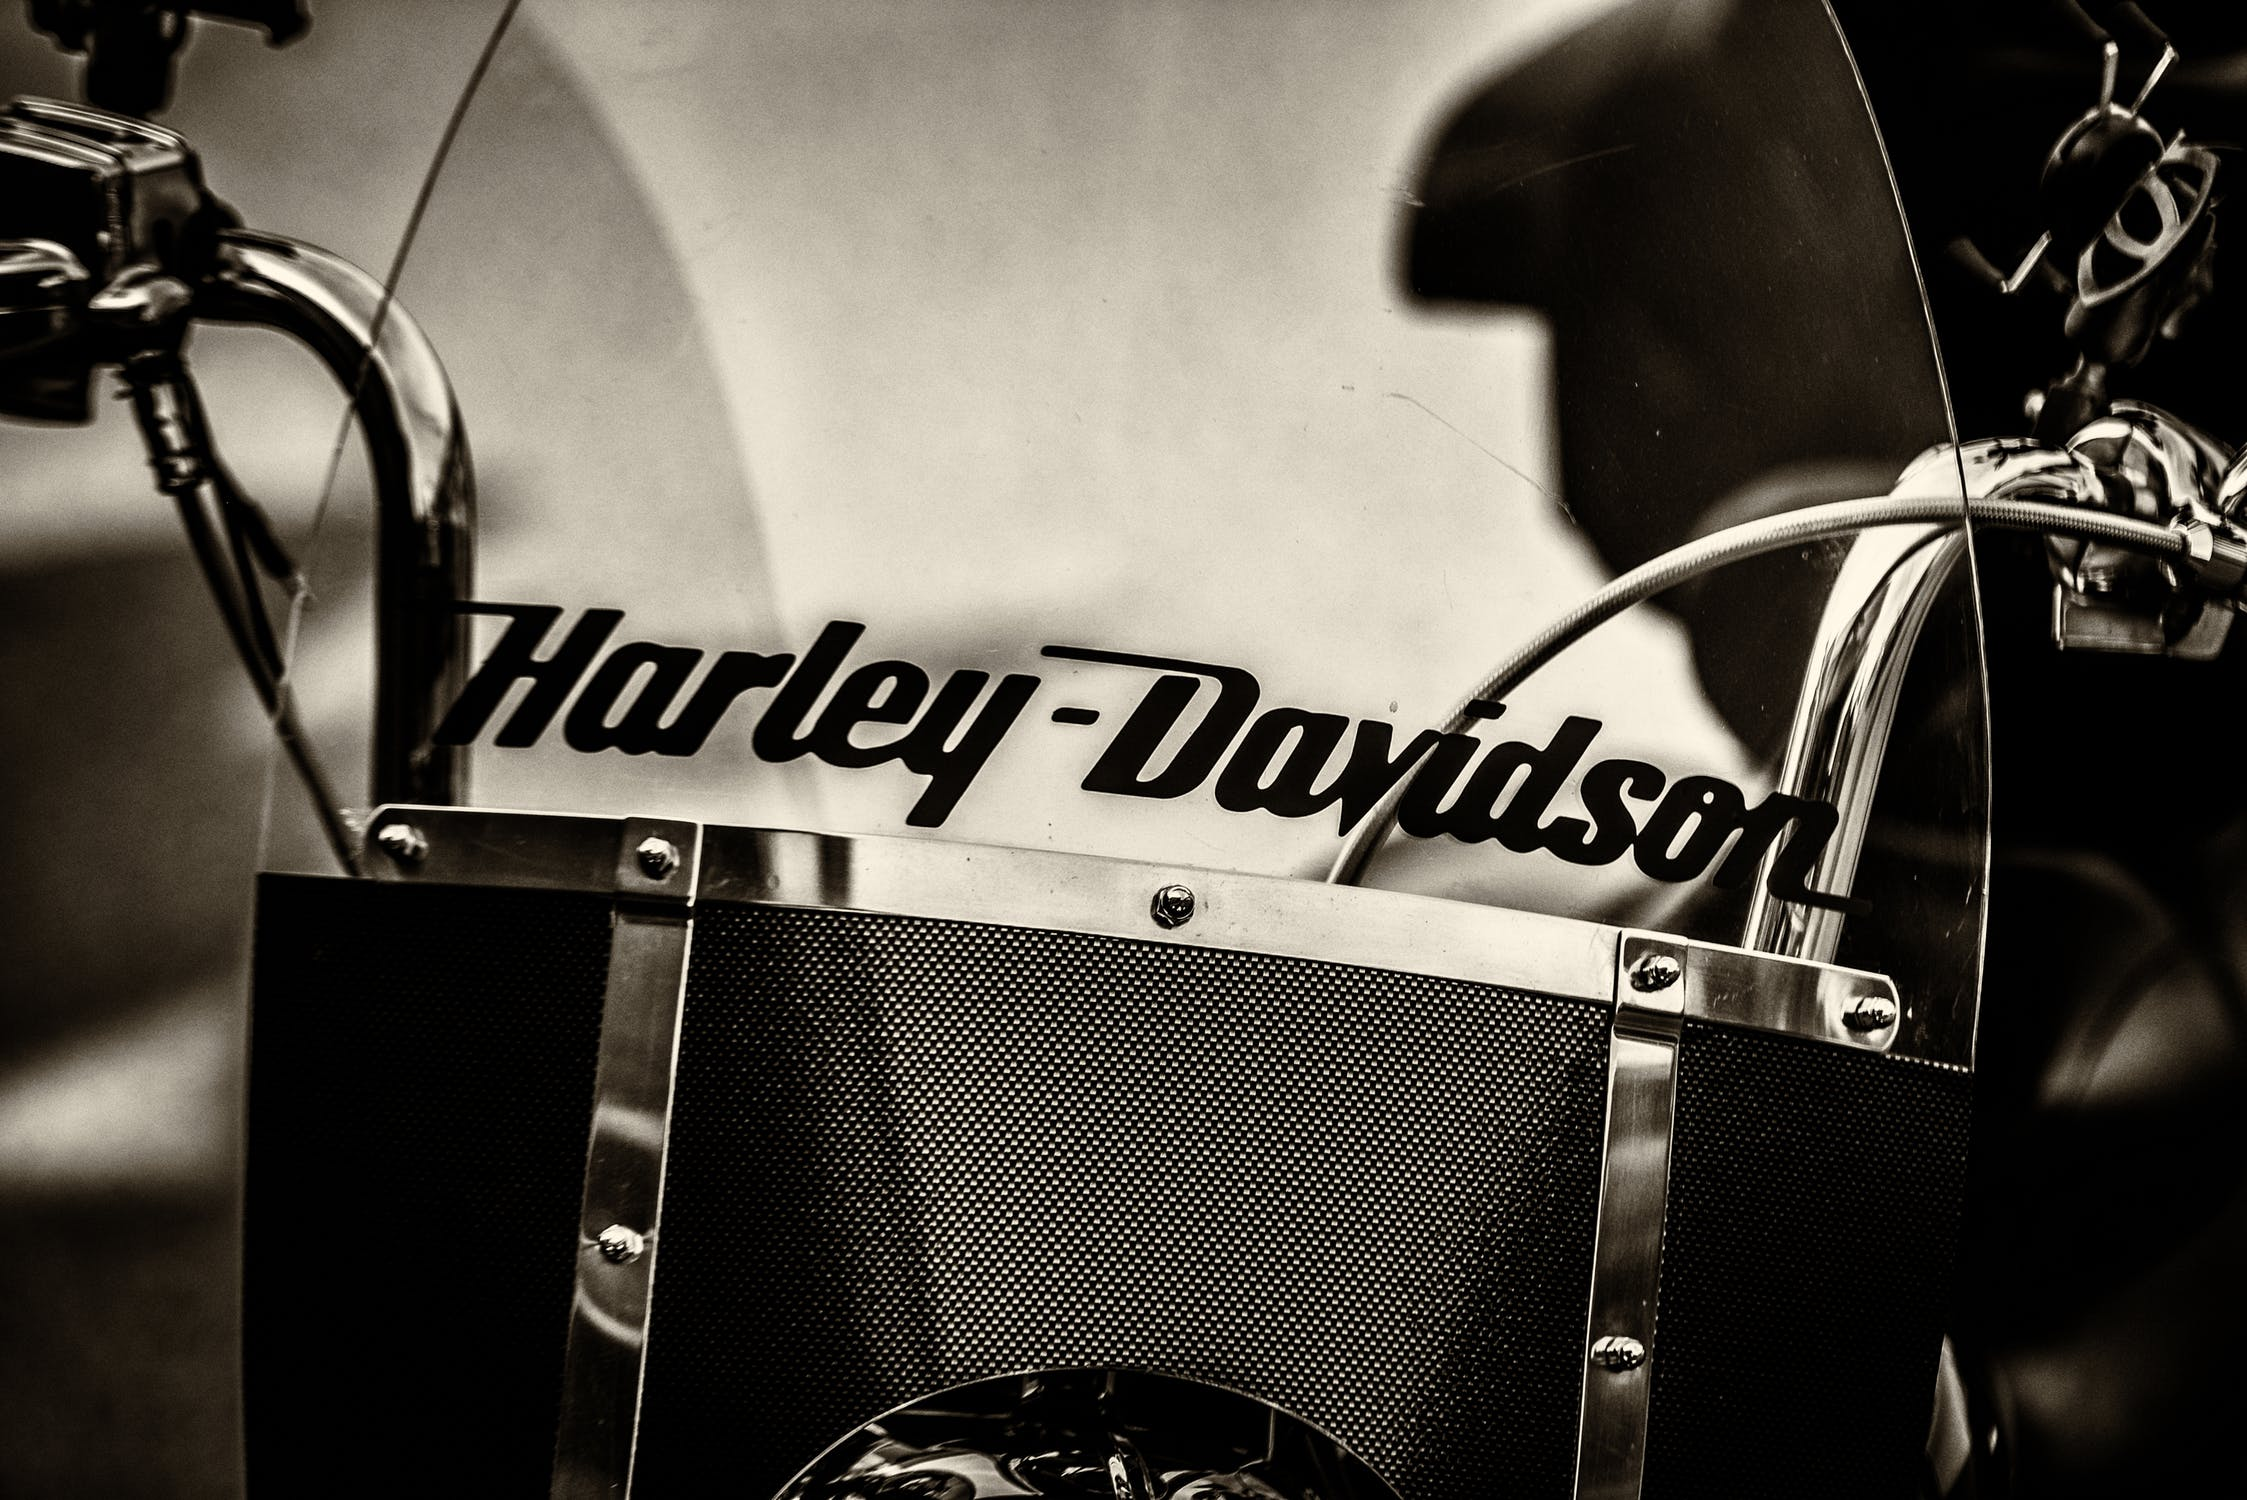 harley davidson for title loan